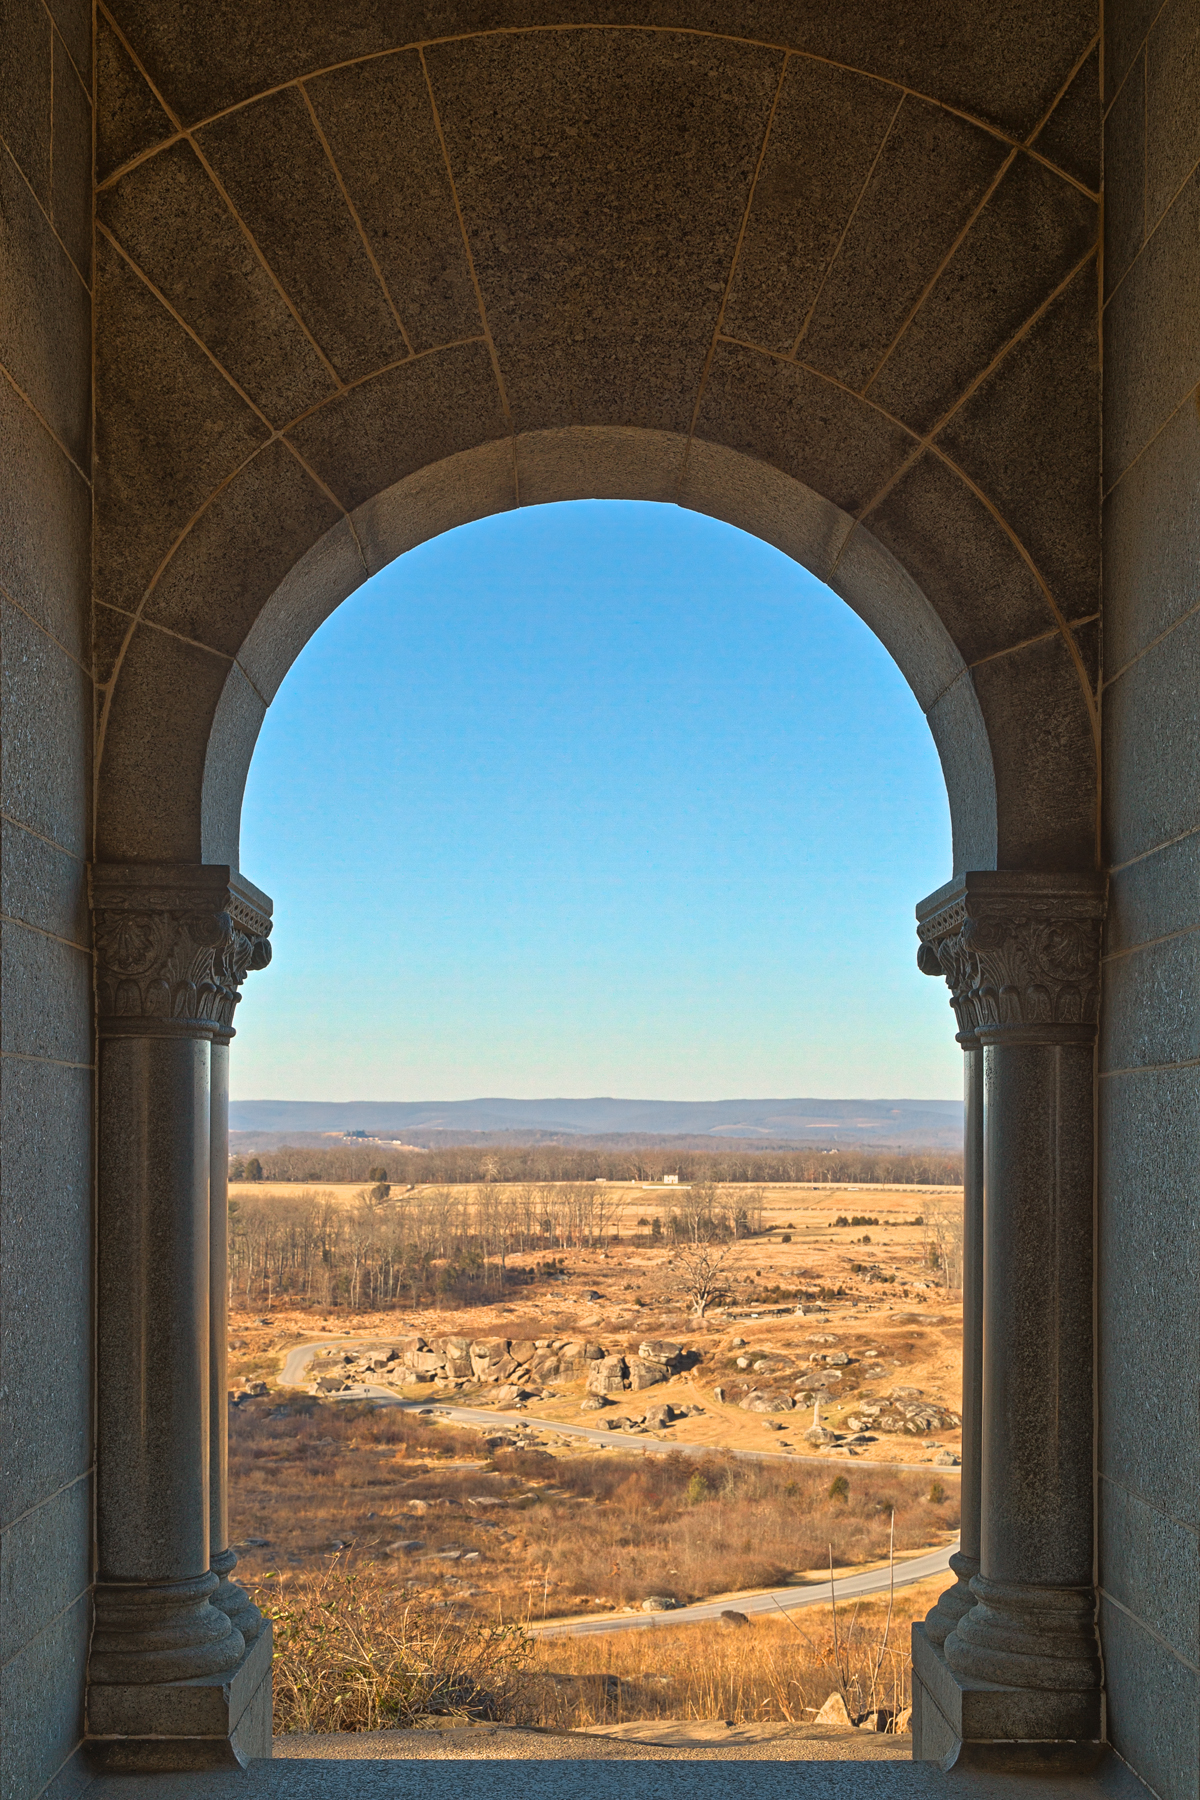 Gateway to Gettysburg - HDR, Outside, Rocks, Rock, Road, HQ Photo